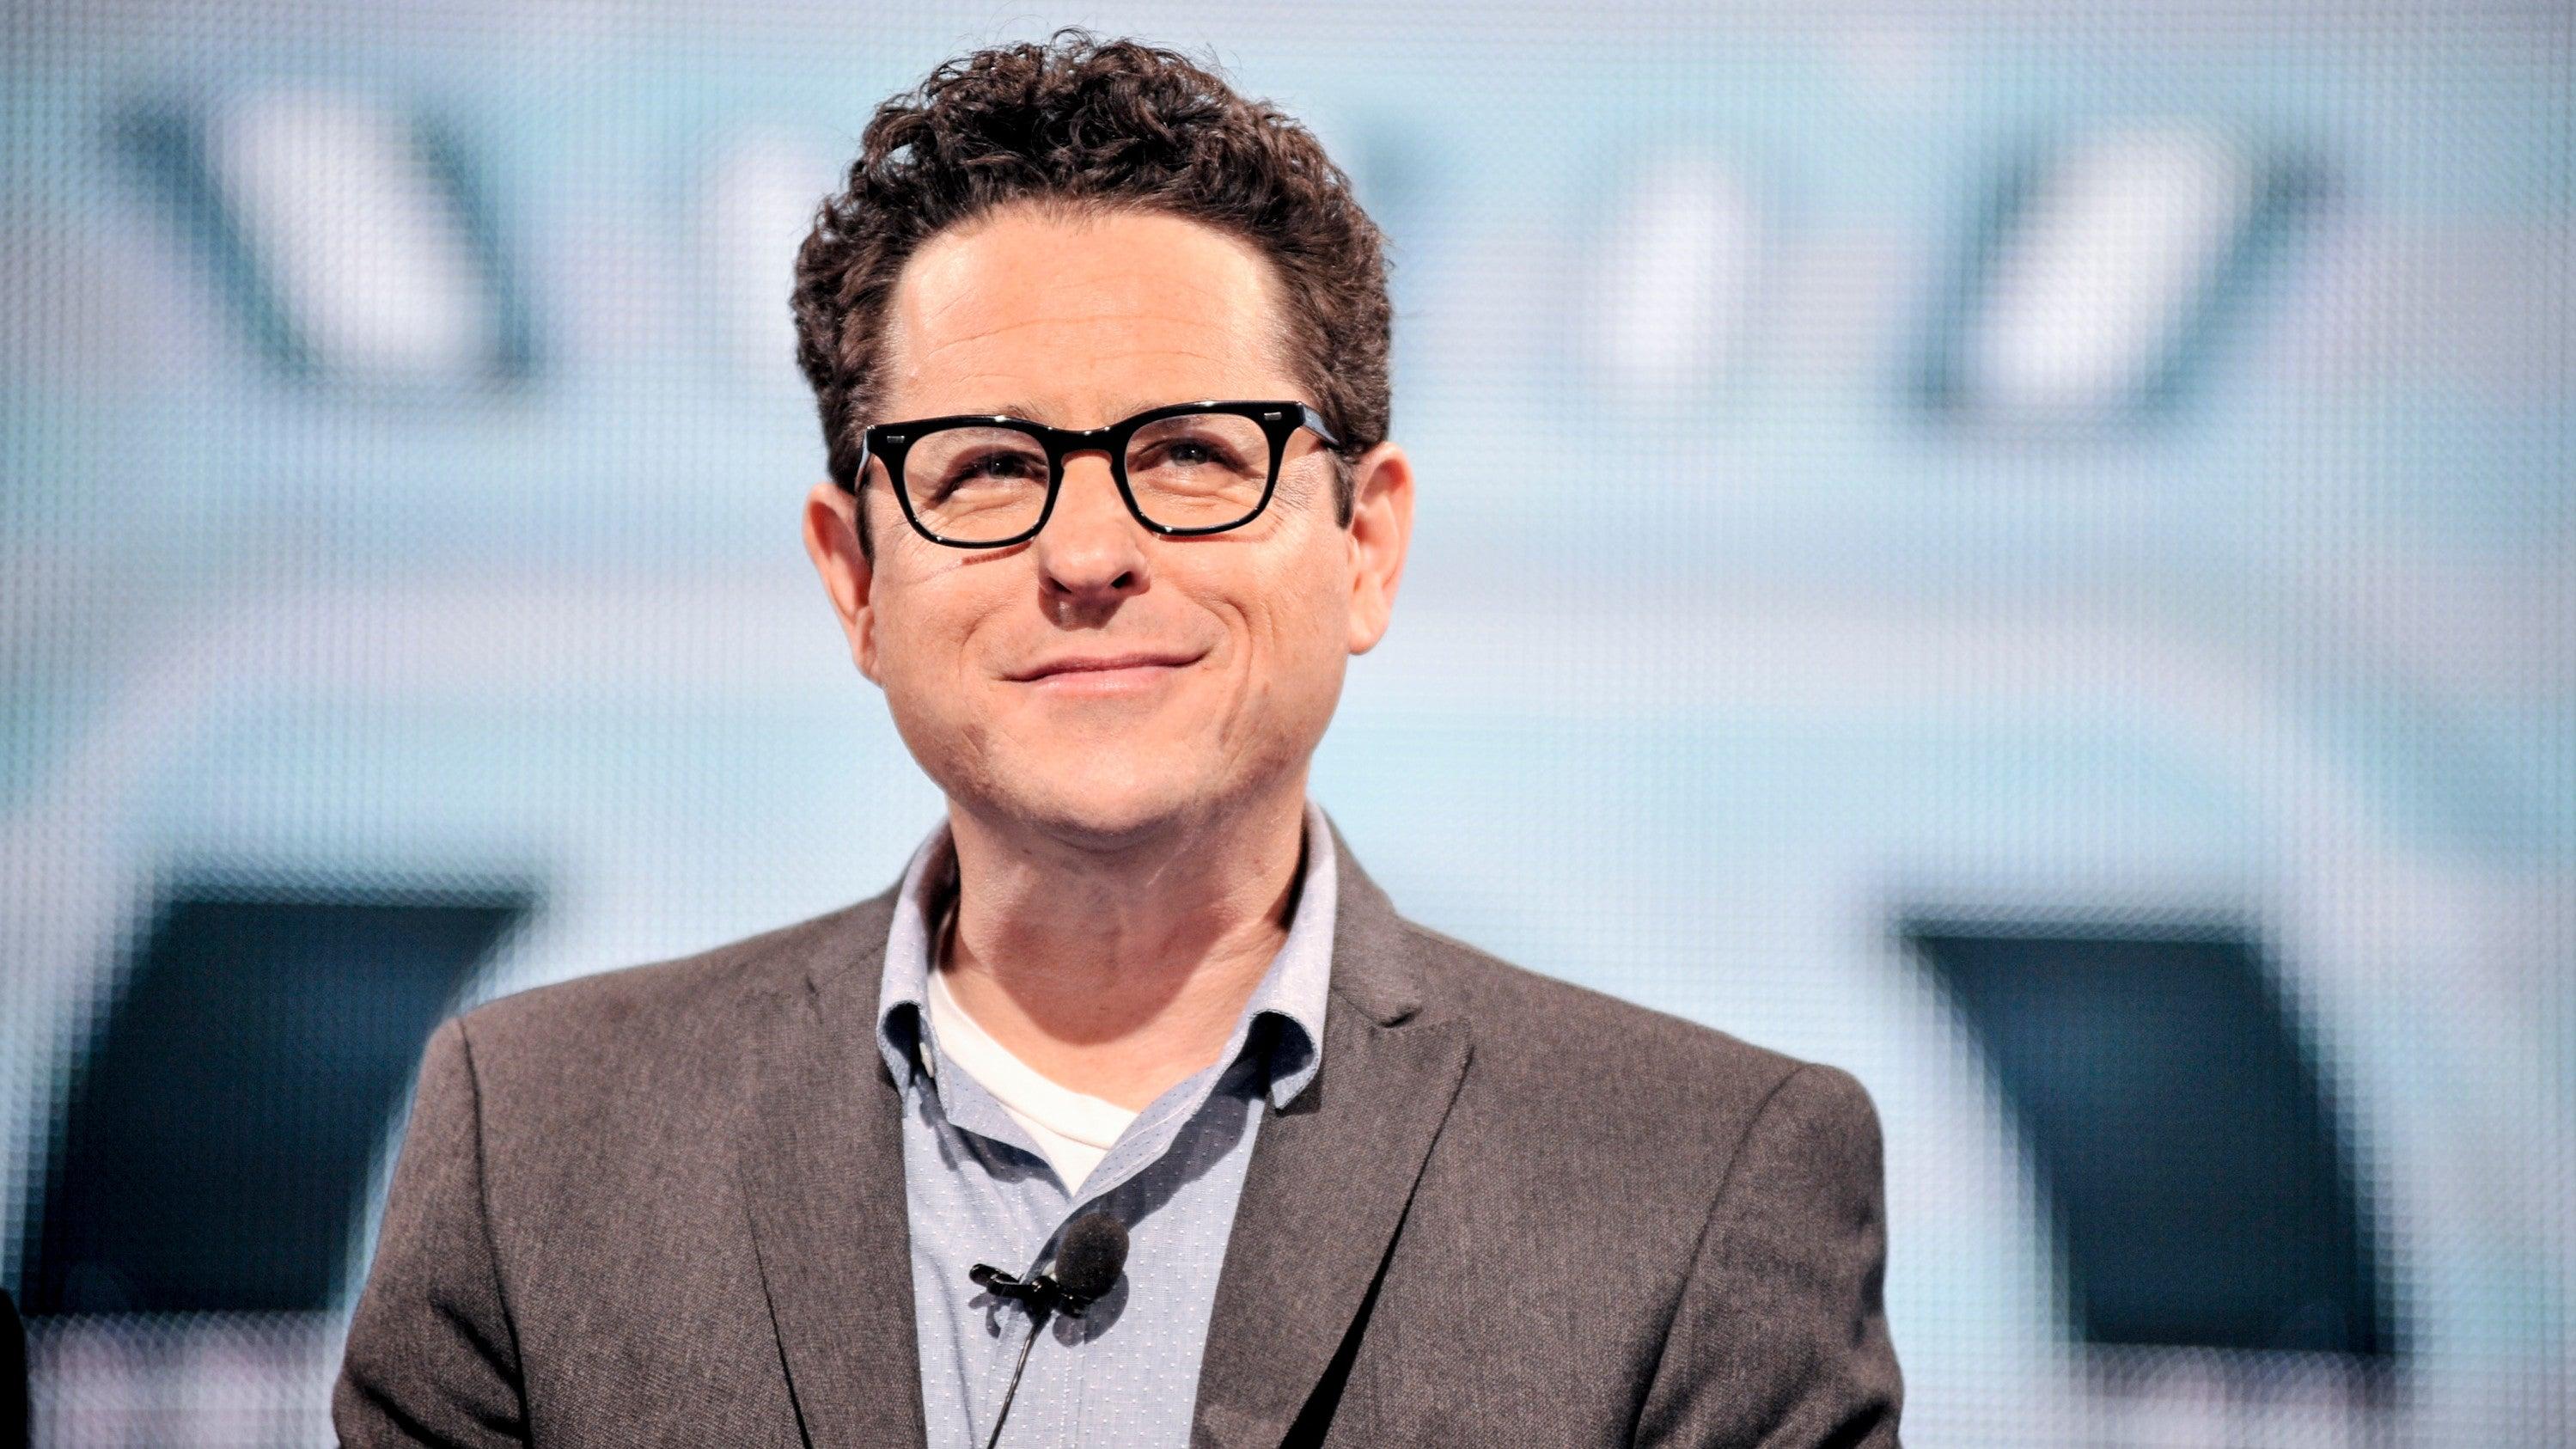 J.J. Abrams' Bad Robot Is Working On A Supernatural Revenge Thriller Called The Pinkerton